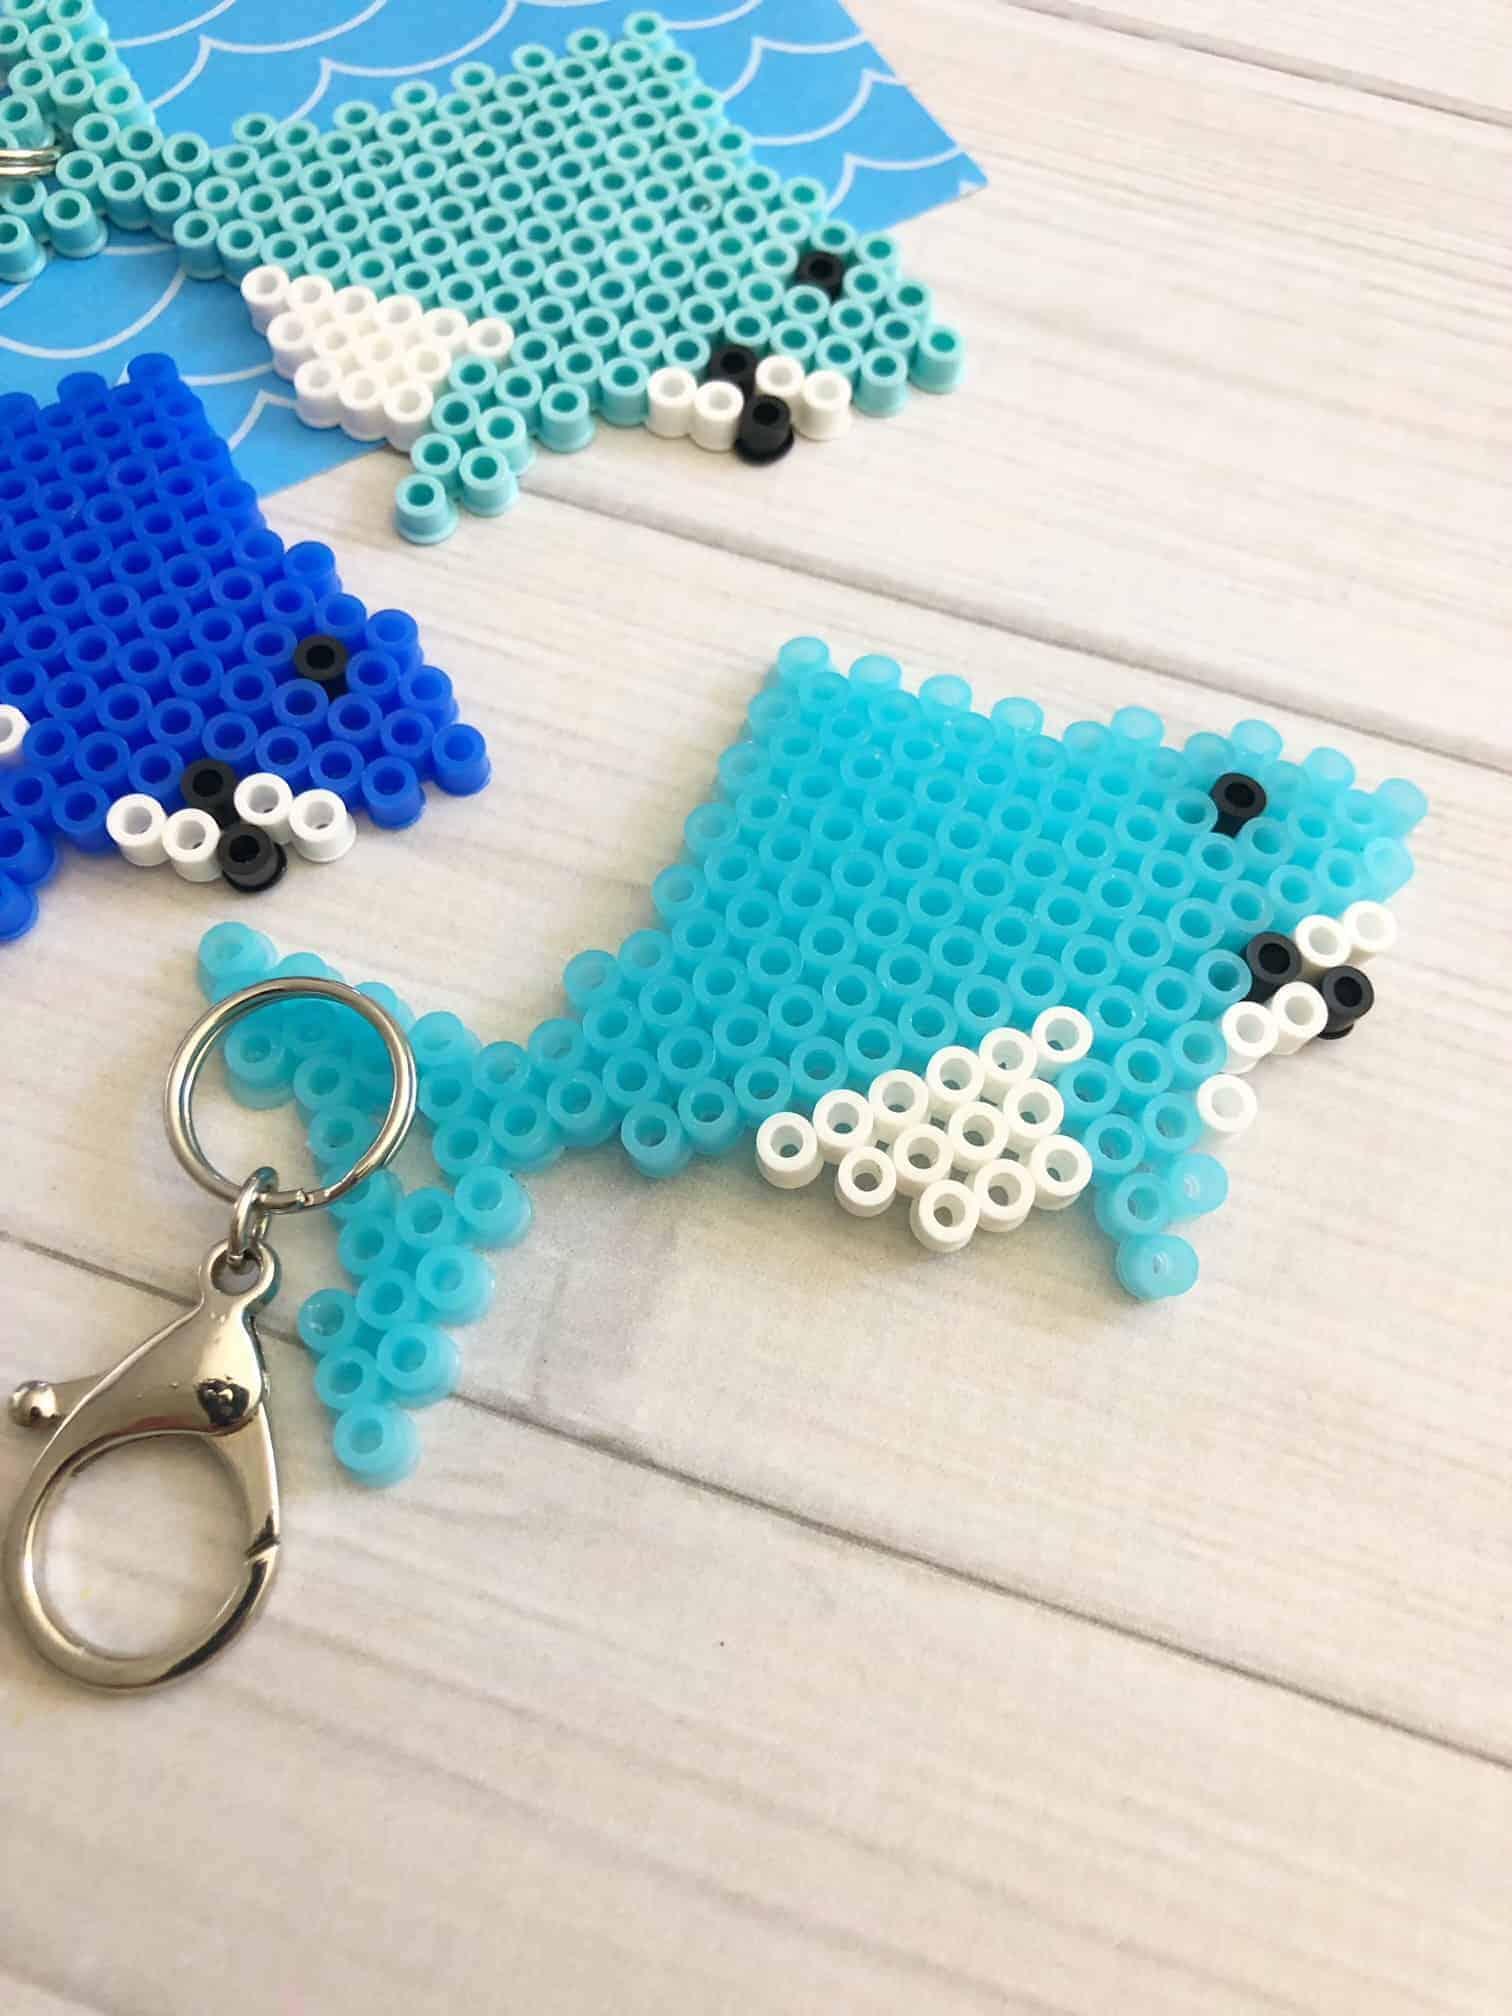 Hama Bead Patterns Diy Shark Keychain The Inspiration Edit